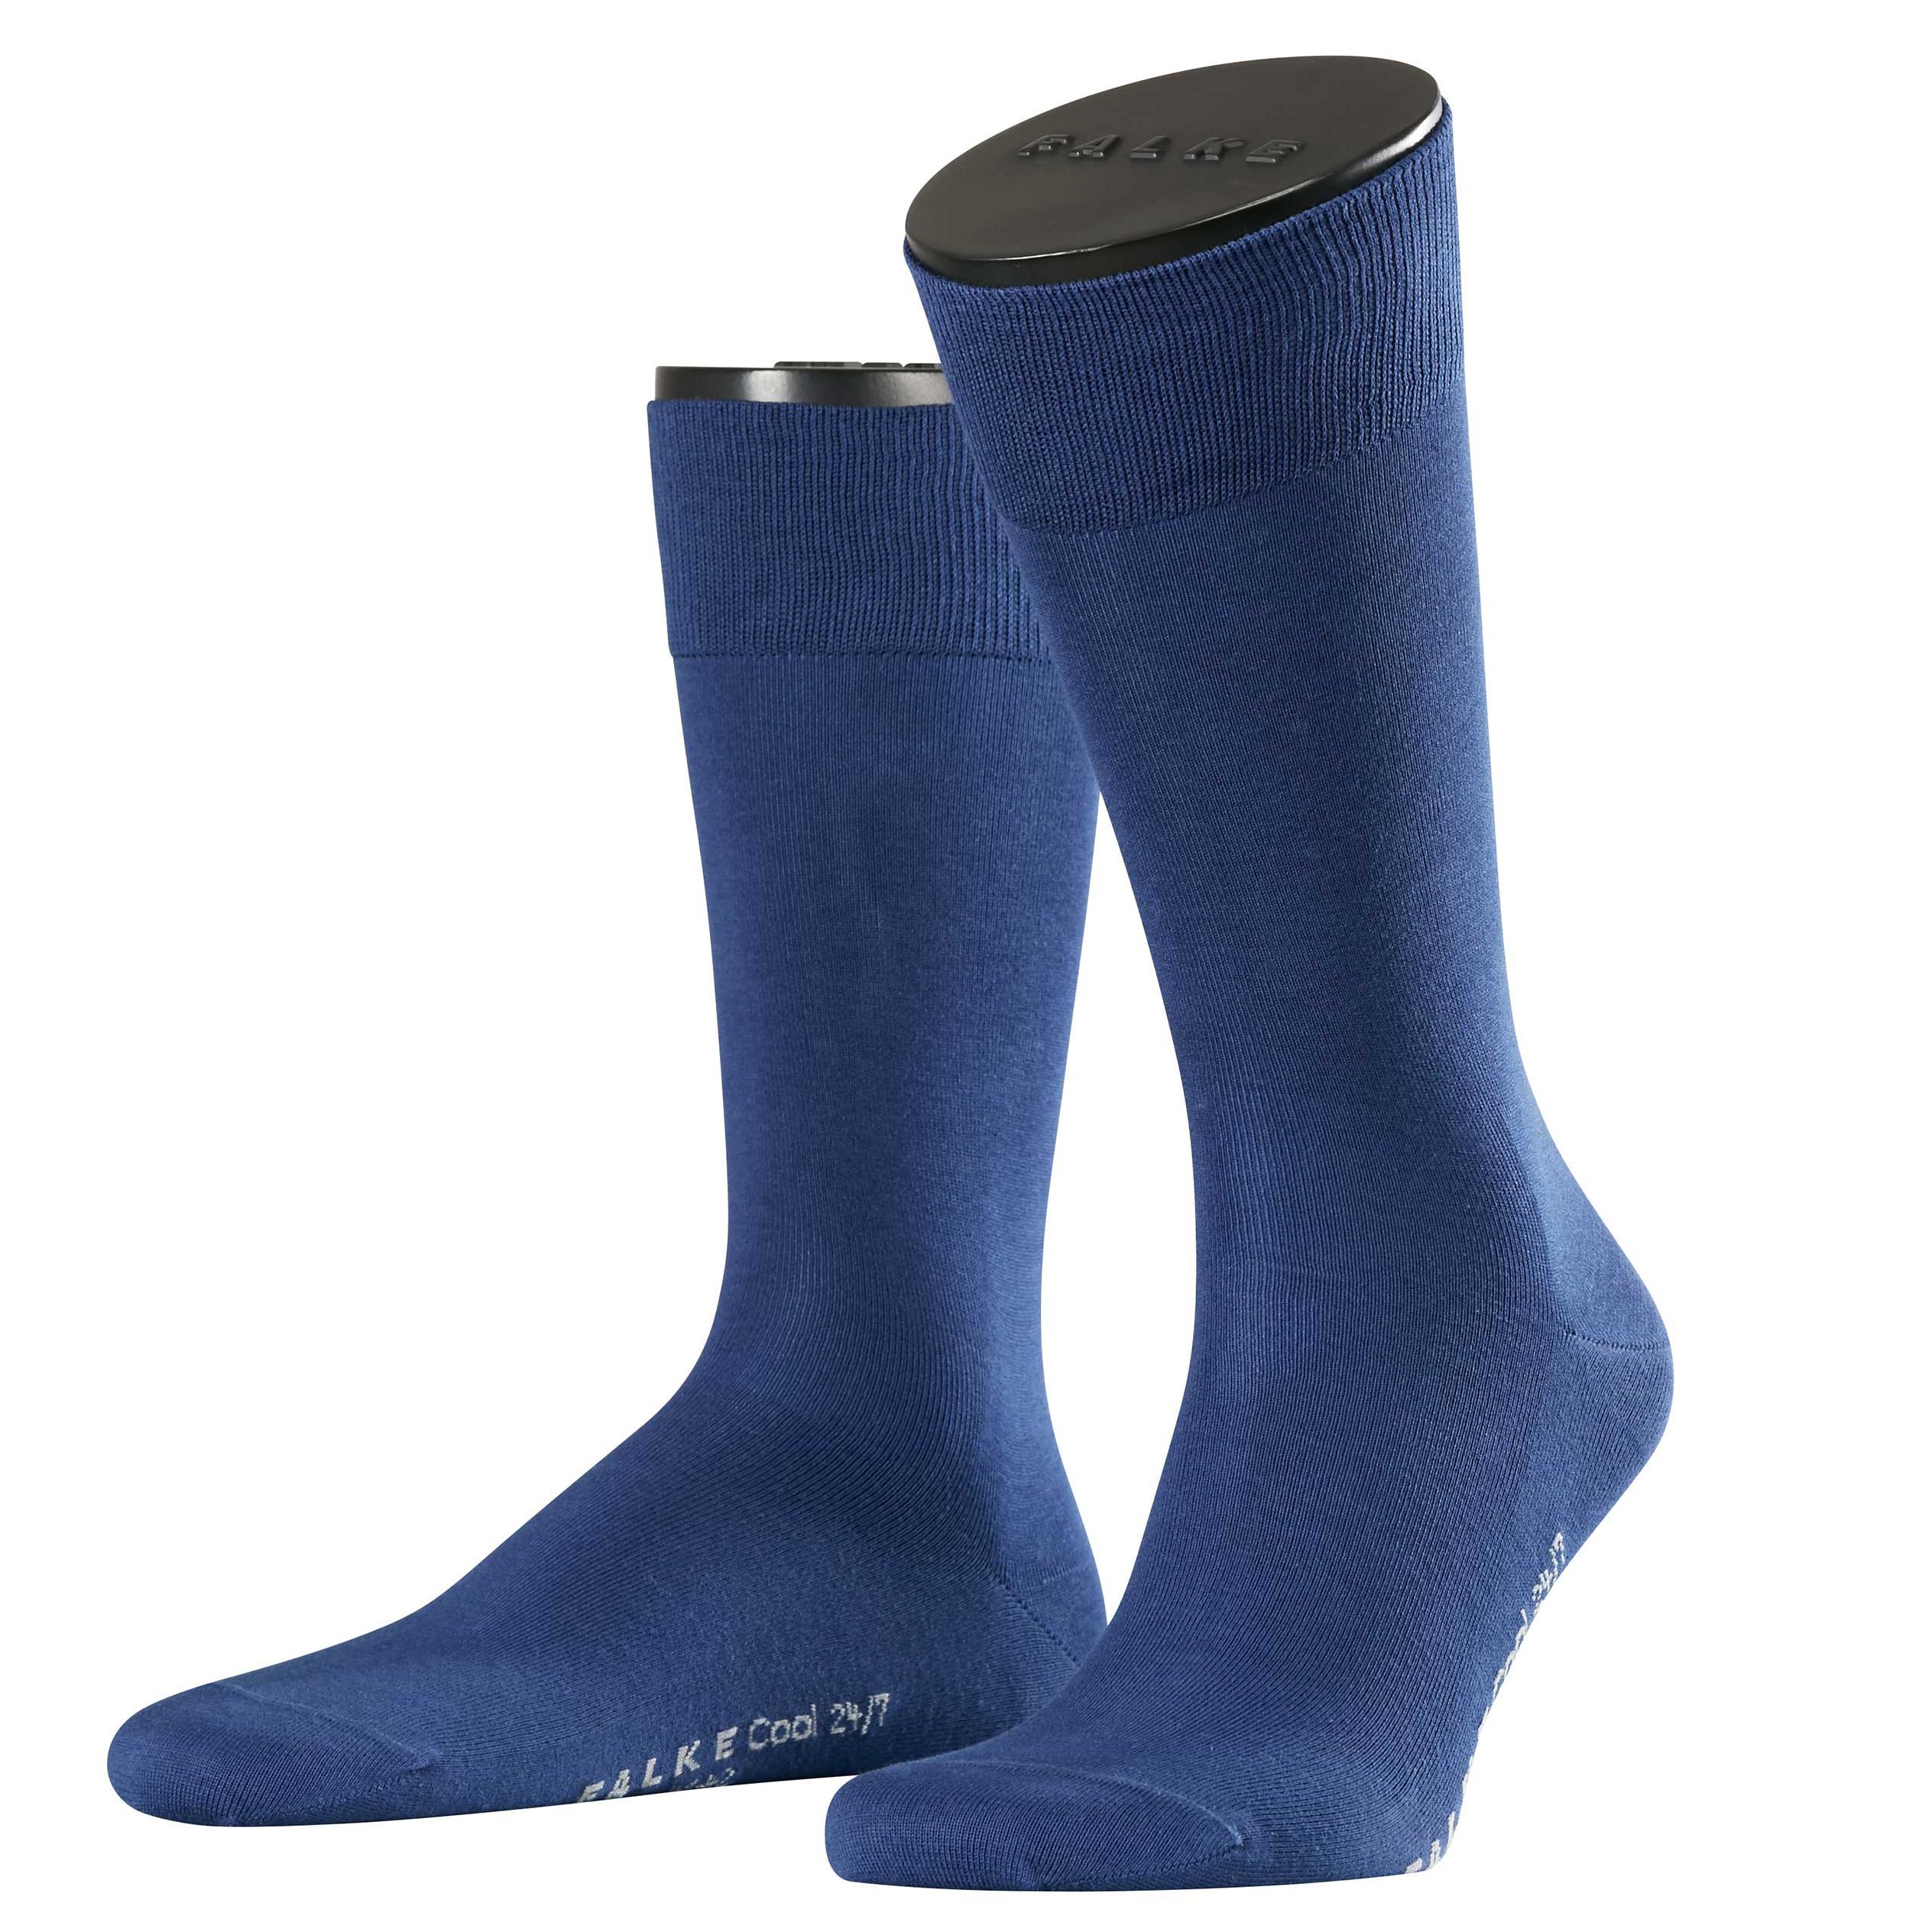 Falke Buisness Socke royal blau 13230 6000 Basic Cool 24/7 Baumwolle